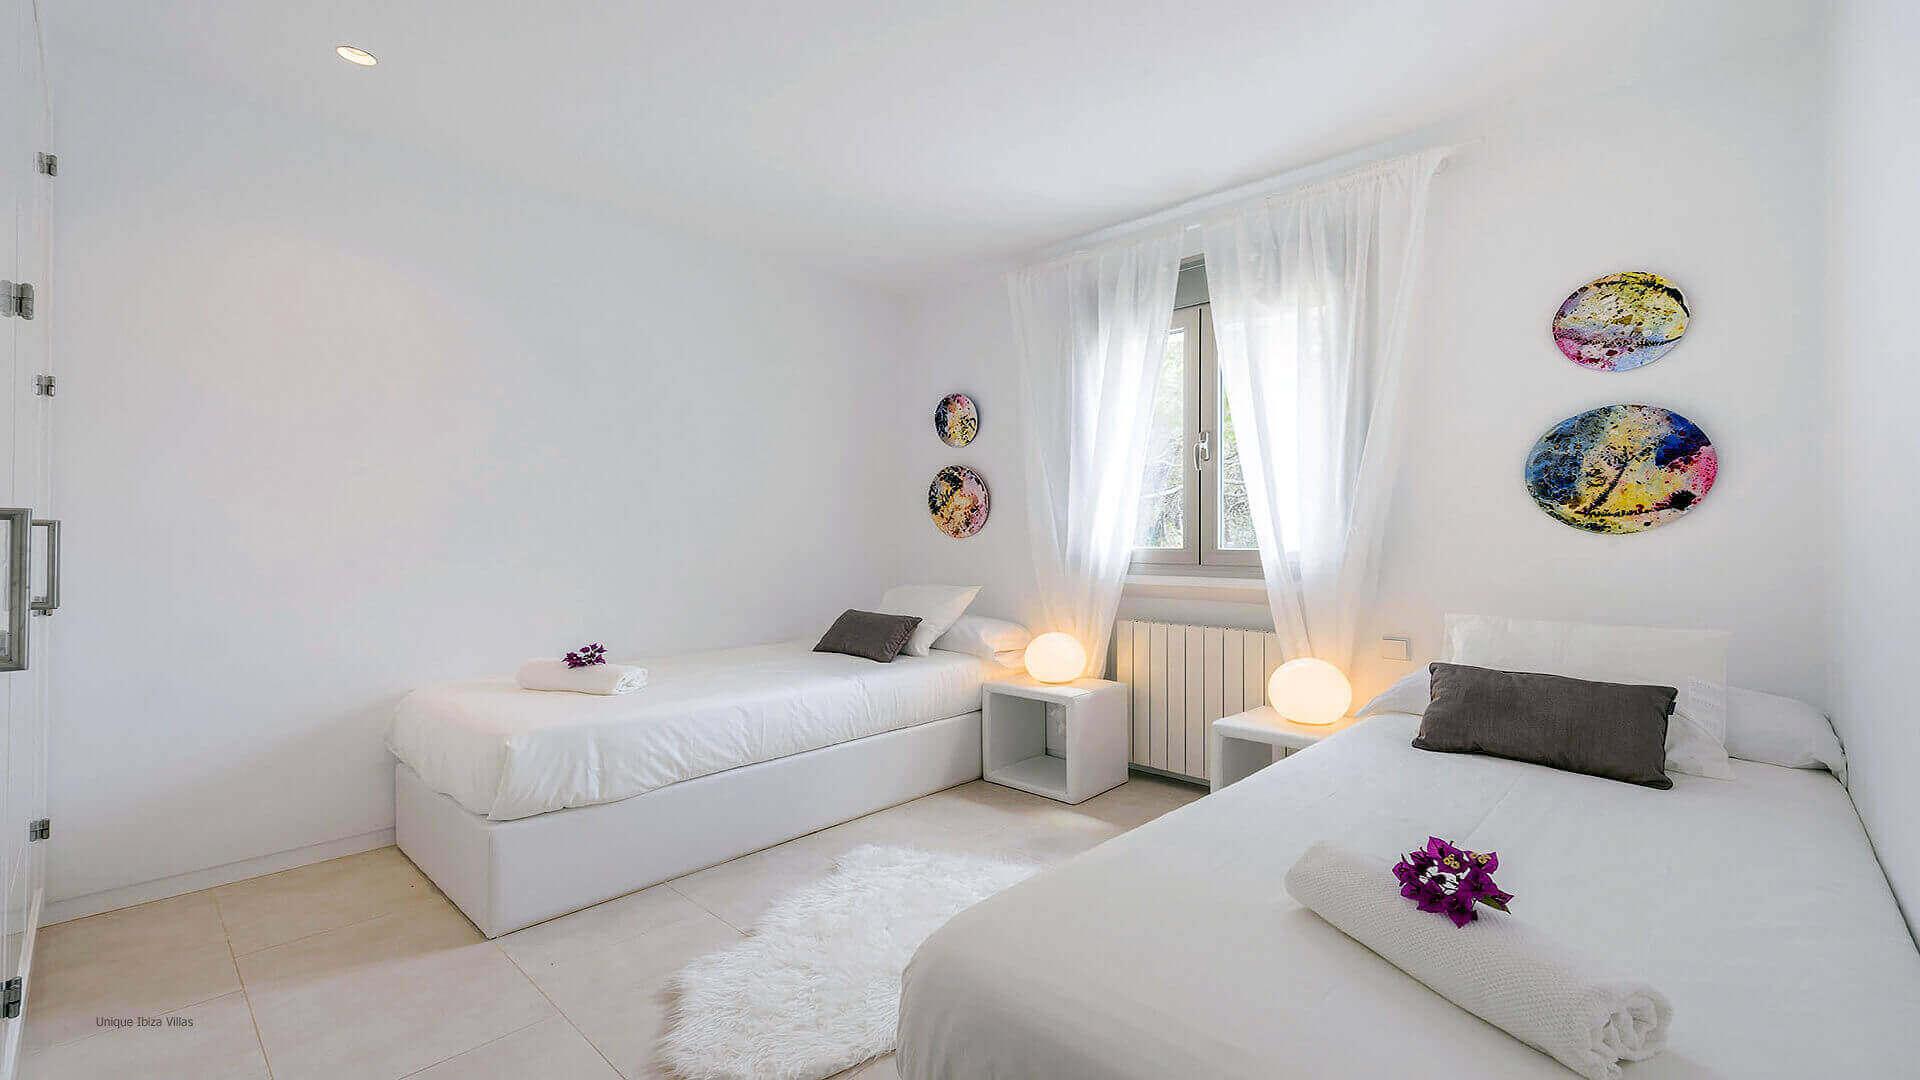 Villa Montecristo Ibiza 37 Bedroom 3